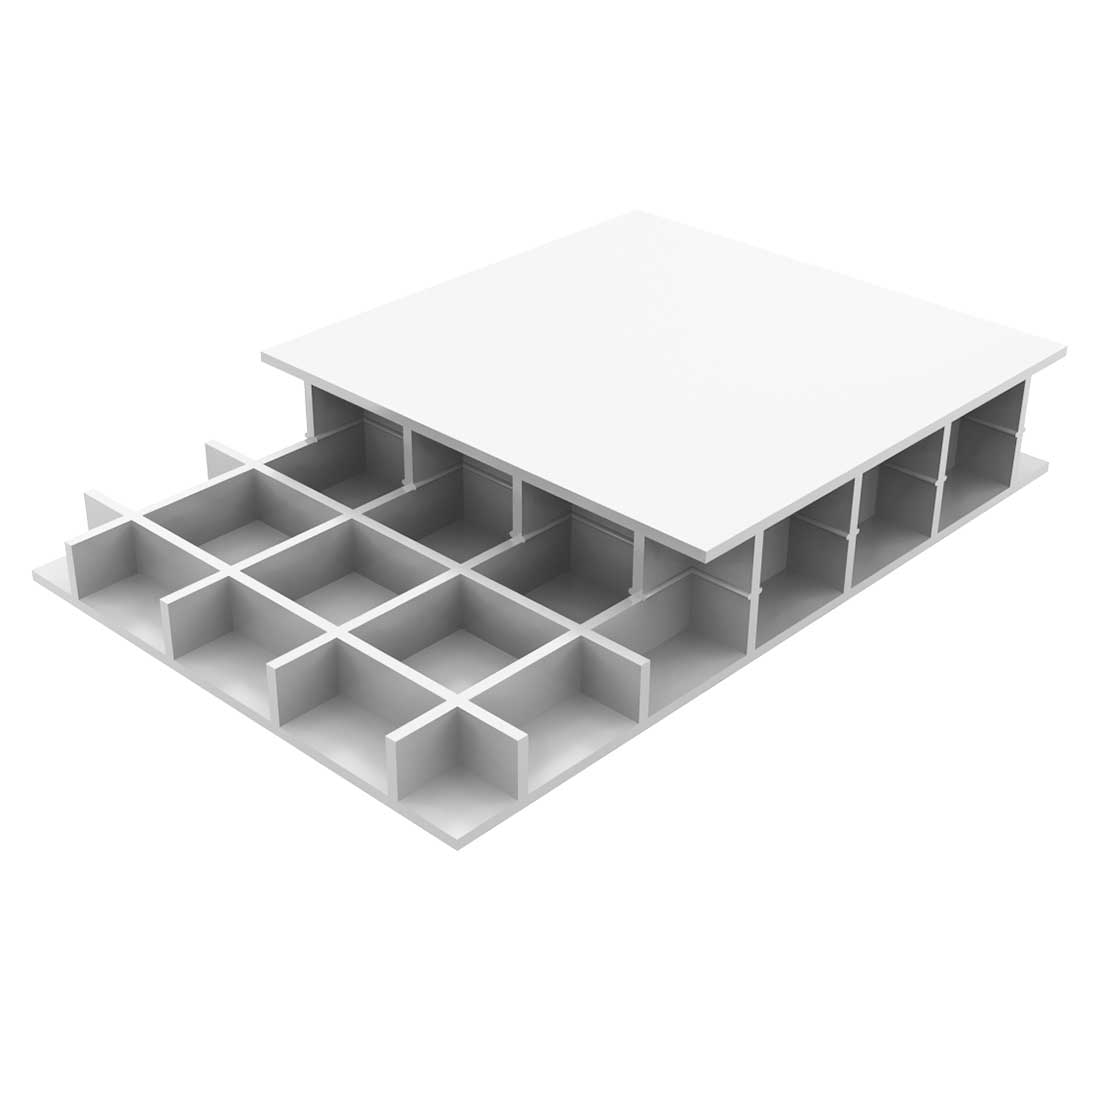 Paneltim PP Constructieplaat 50/100 Uv Wit RAL9010 1200x1000x20mm